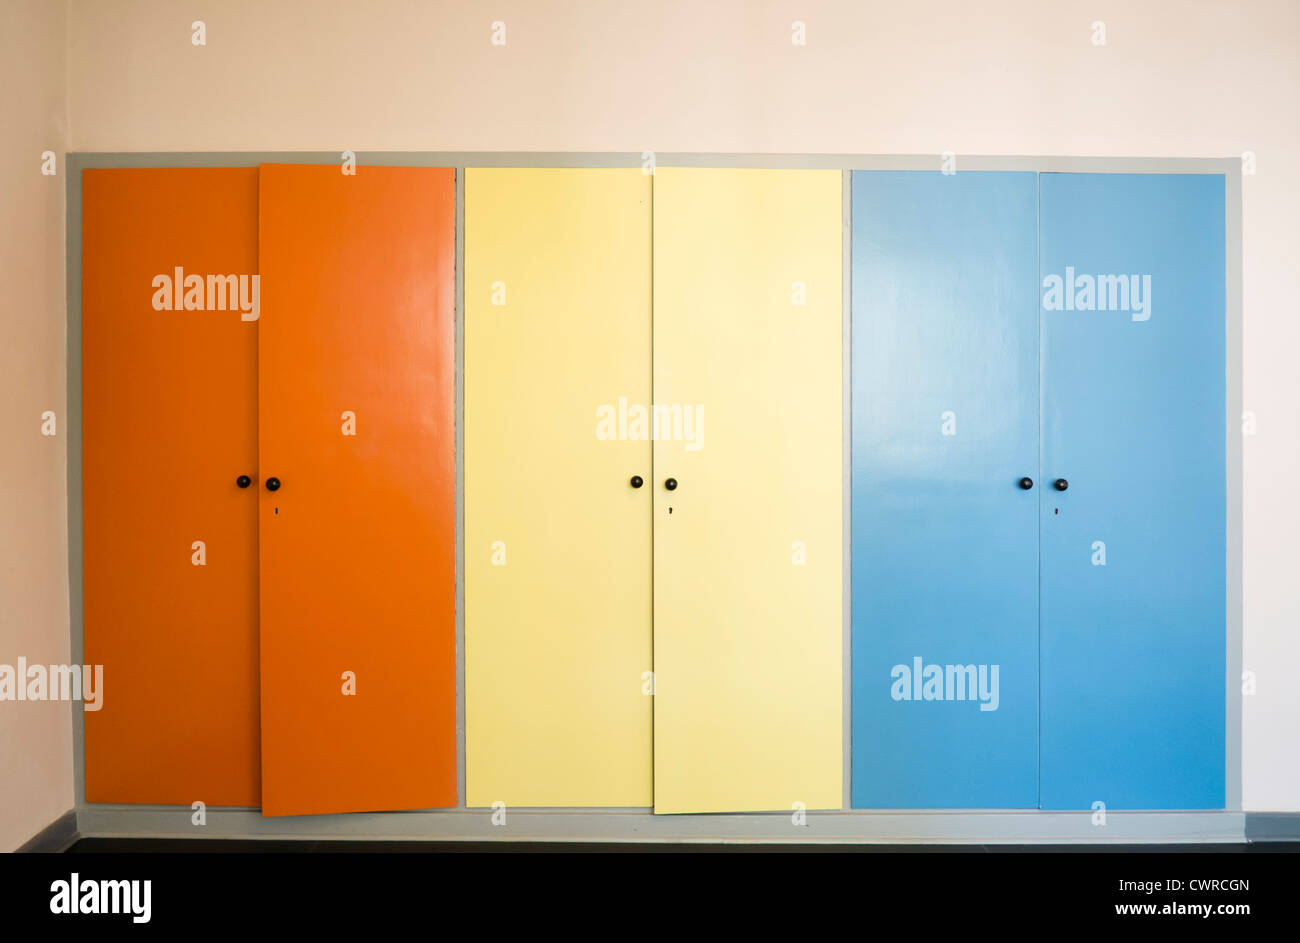 Masters stockfotos masters bilder alamy - Bauhaus architektur hauser ...